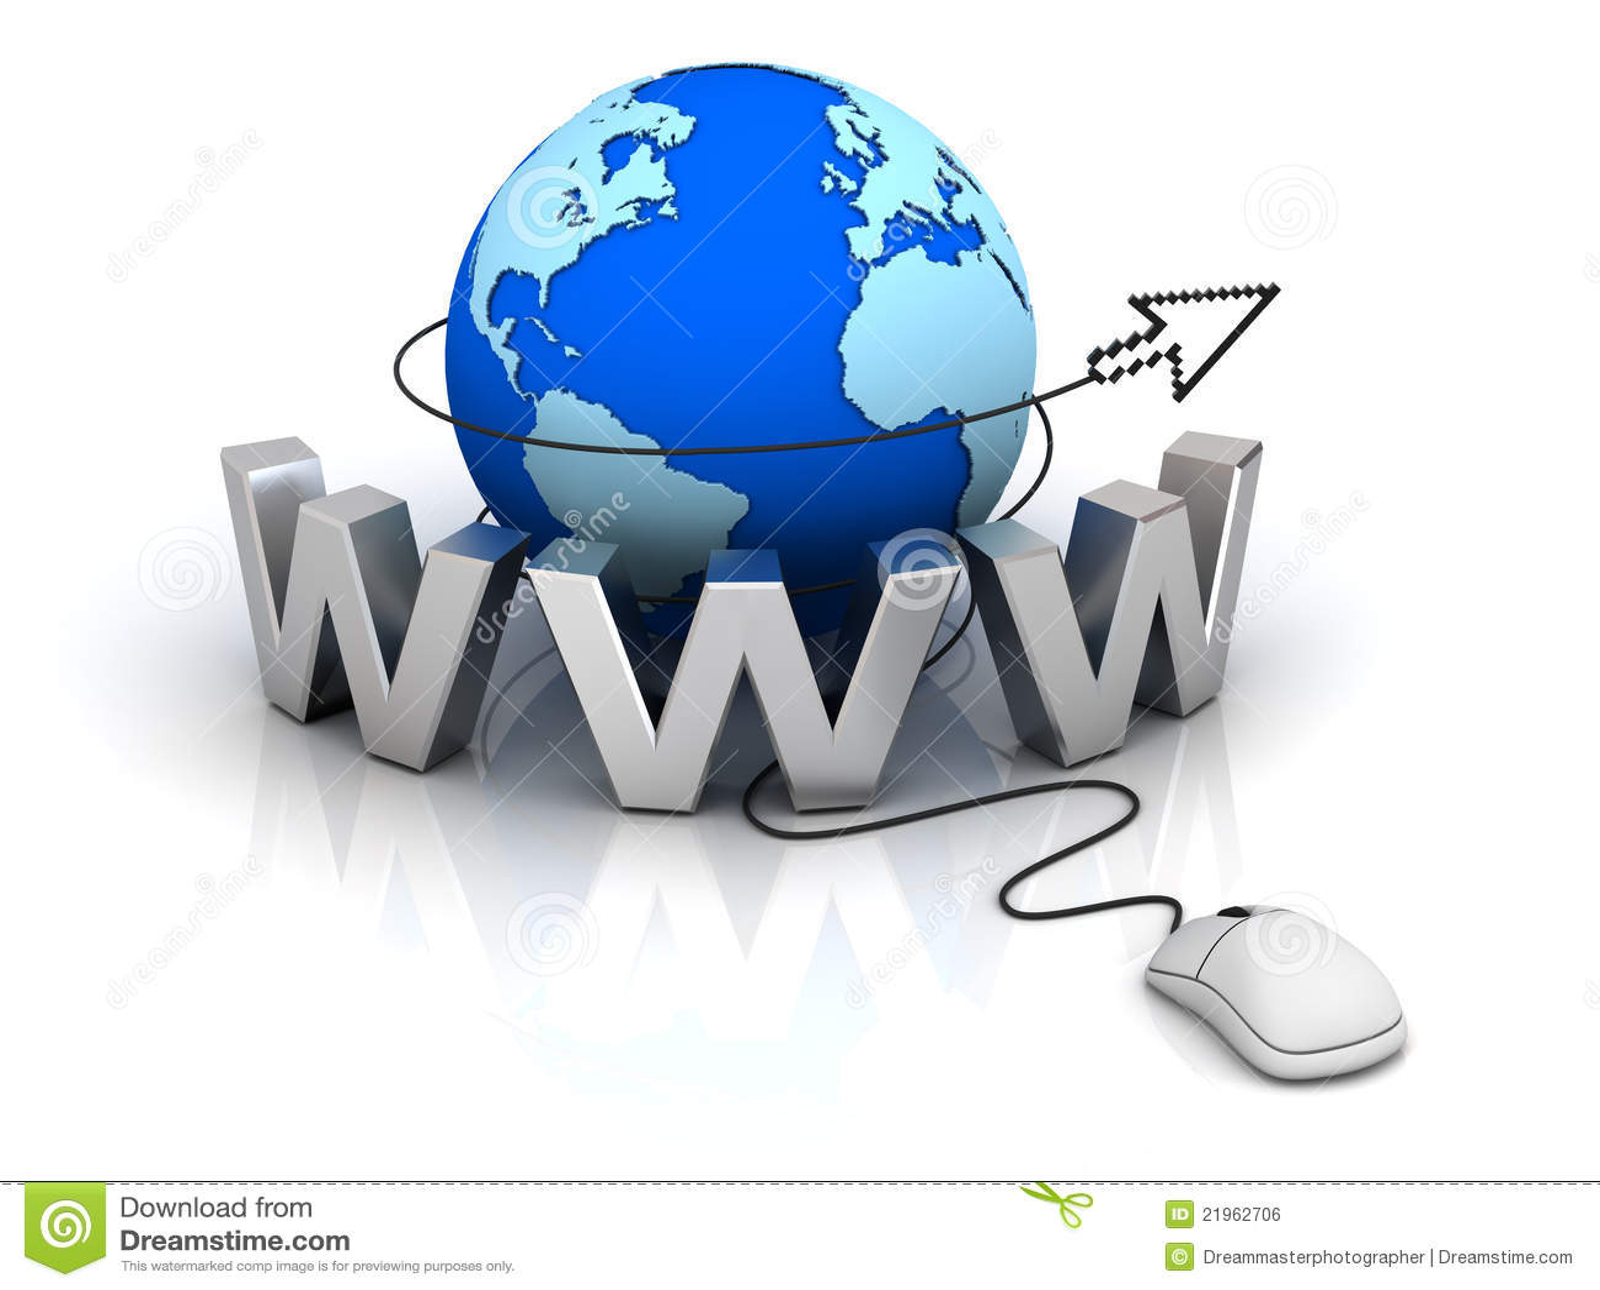 internet web: